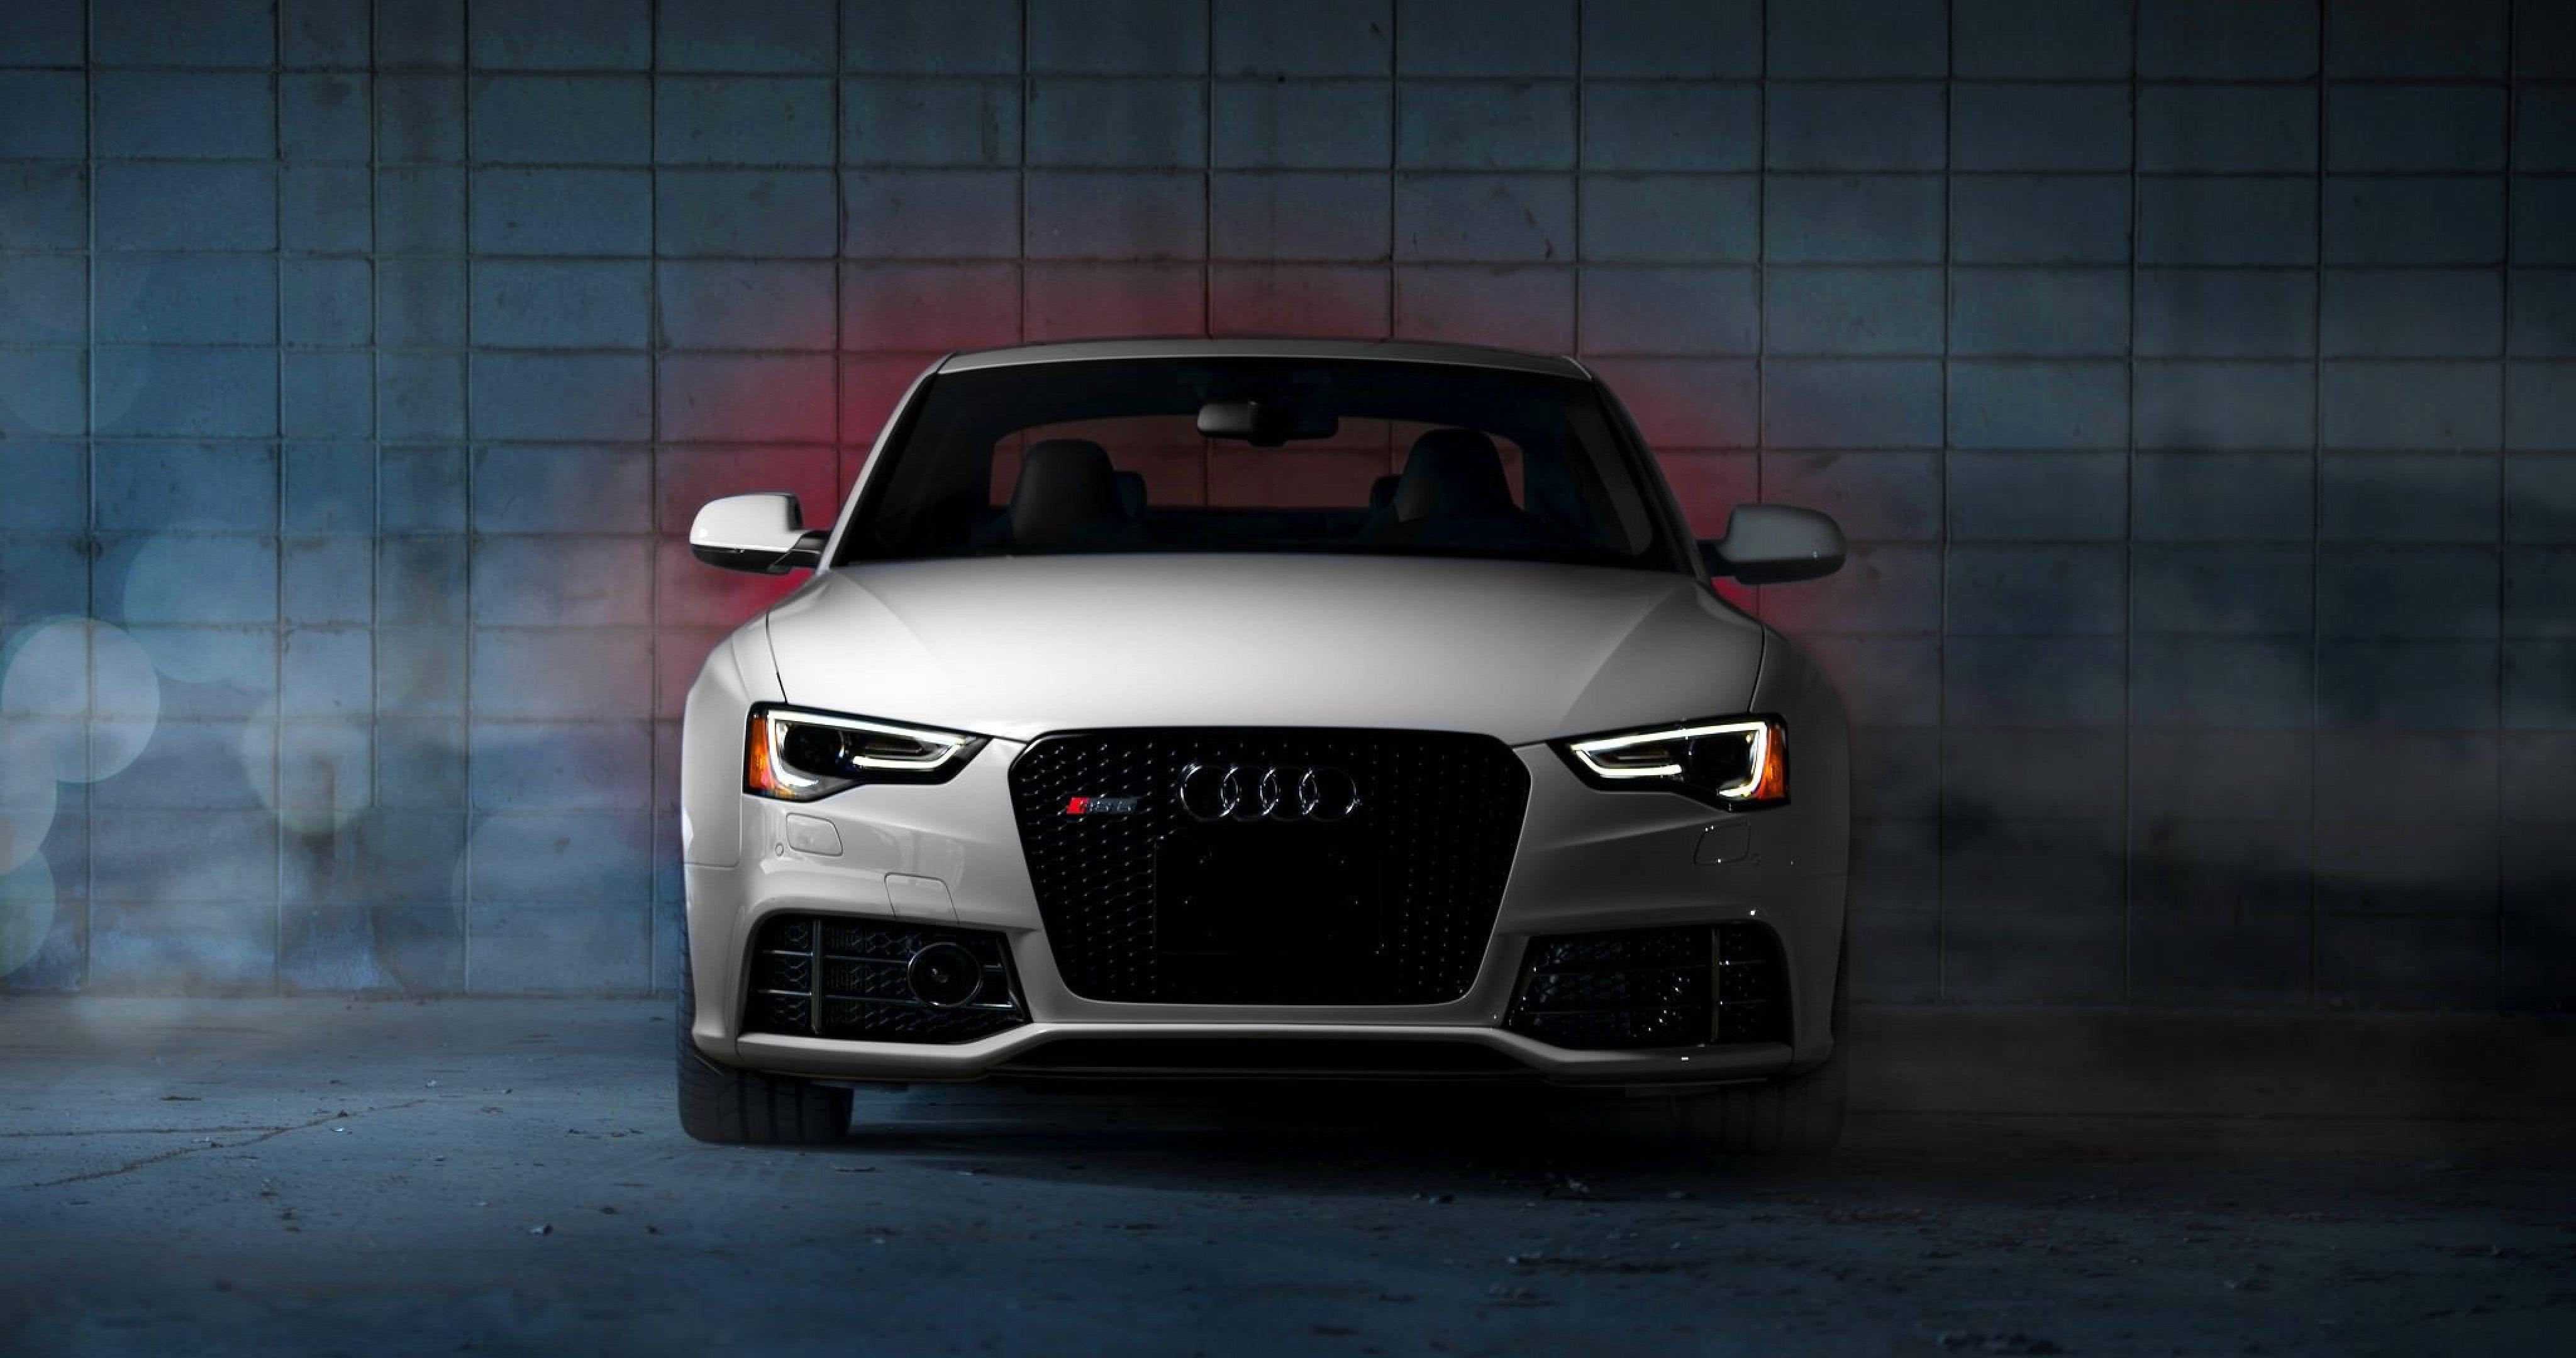 Audi Rs5 Front 4k Ultra Hd Wallpaper Ololoshenka Pinterest